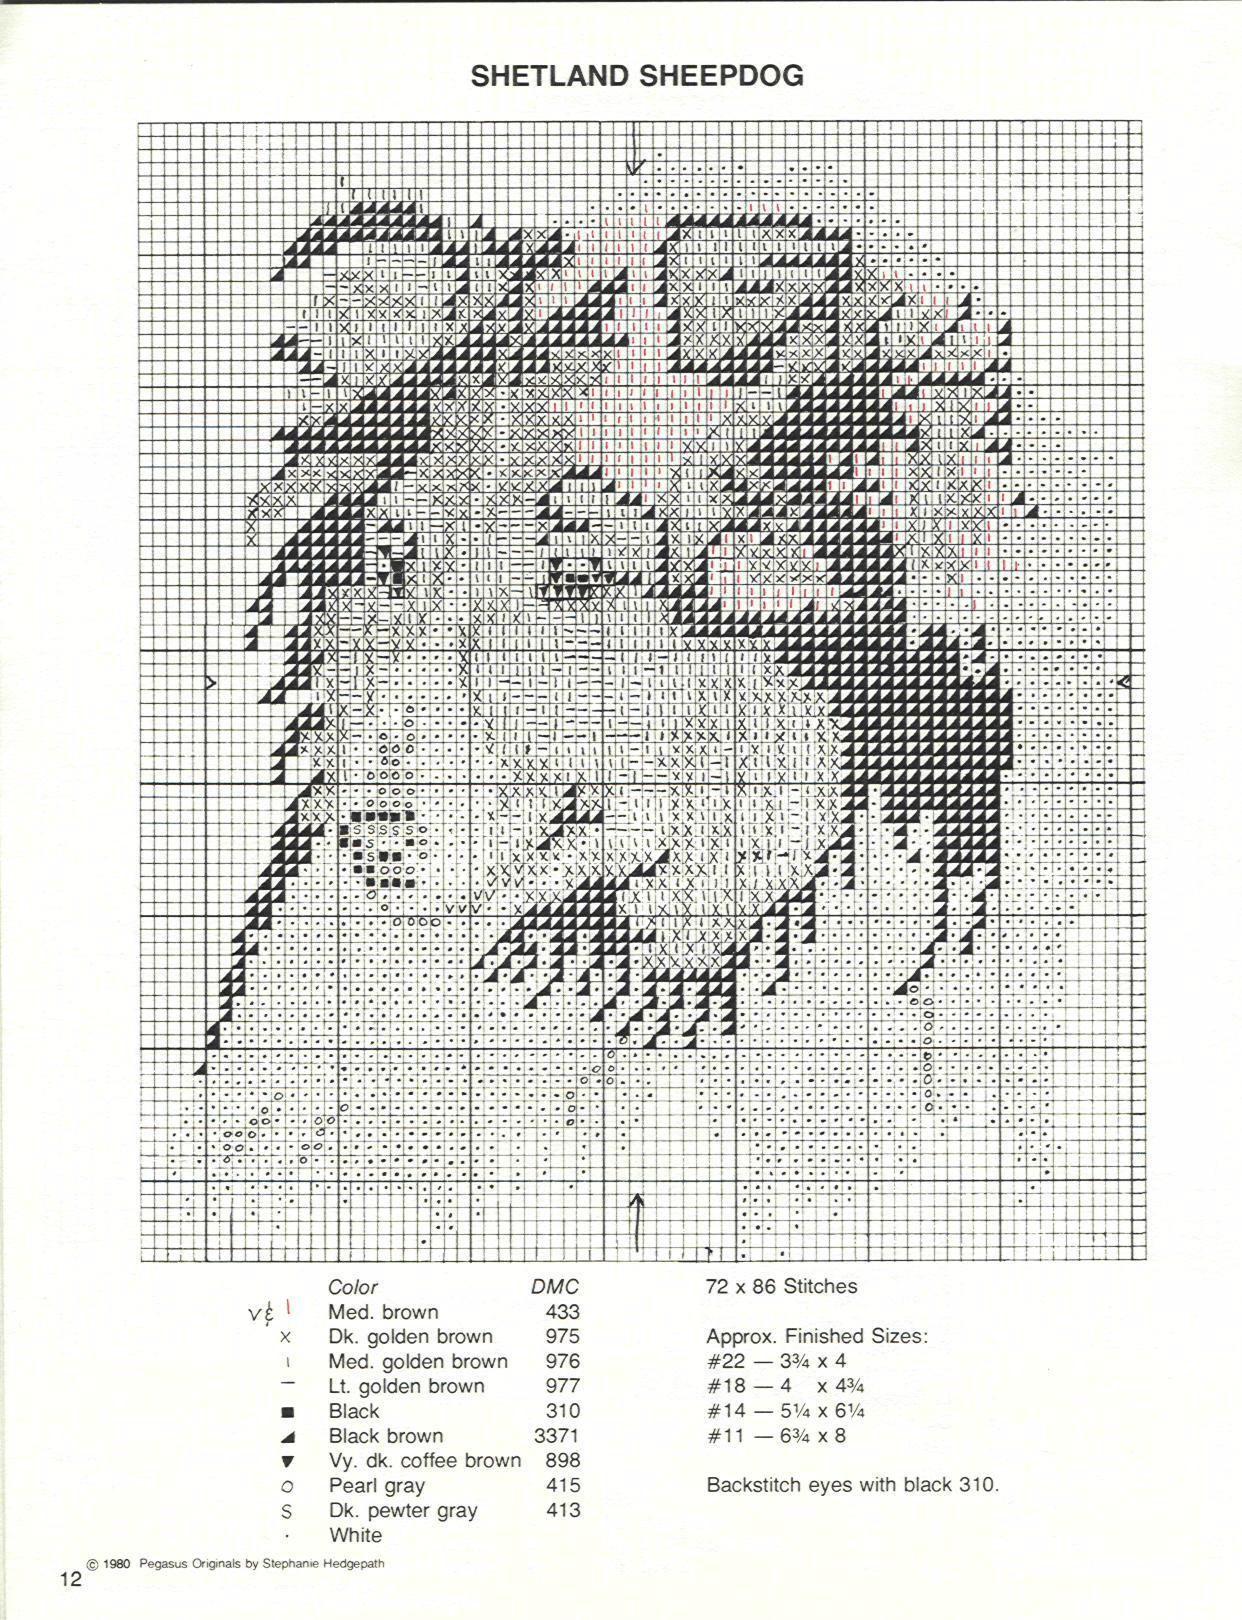 Sheltie dog cross stitch pattern chart sable click to enlarge sheltie dog cross stitch pattern chart sable click to enlarge cross stitch cats and dogs pinterest cross stitch stitch and chart nvjuhfo Images